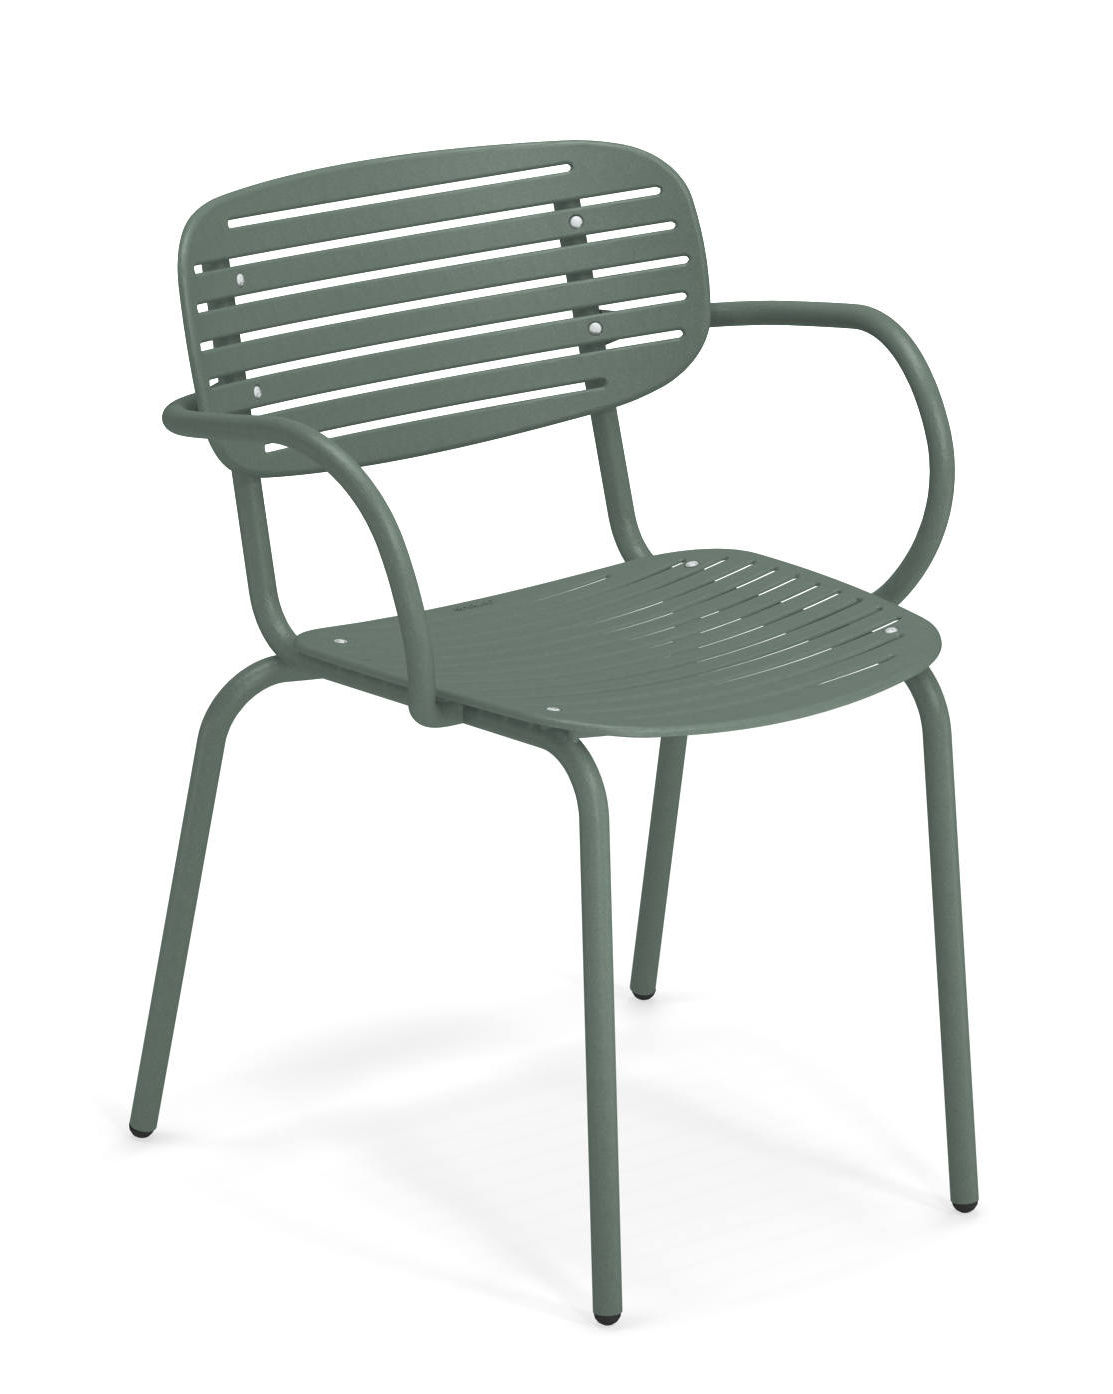 Möbel - Stühle  - Mom Stapelbarer Sessel / Metall - Emu - Dunkelgrün - gefirnister Stahl